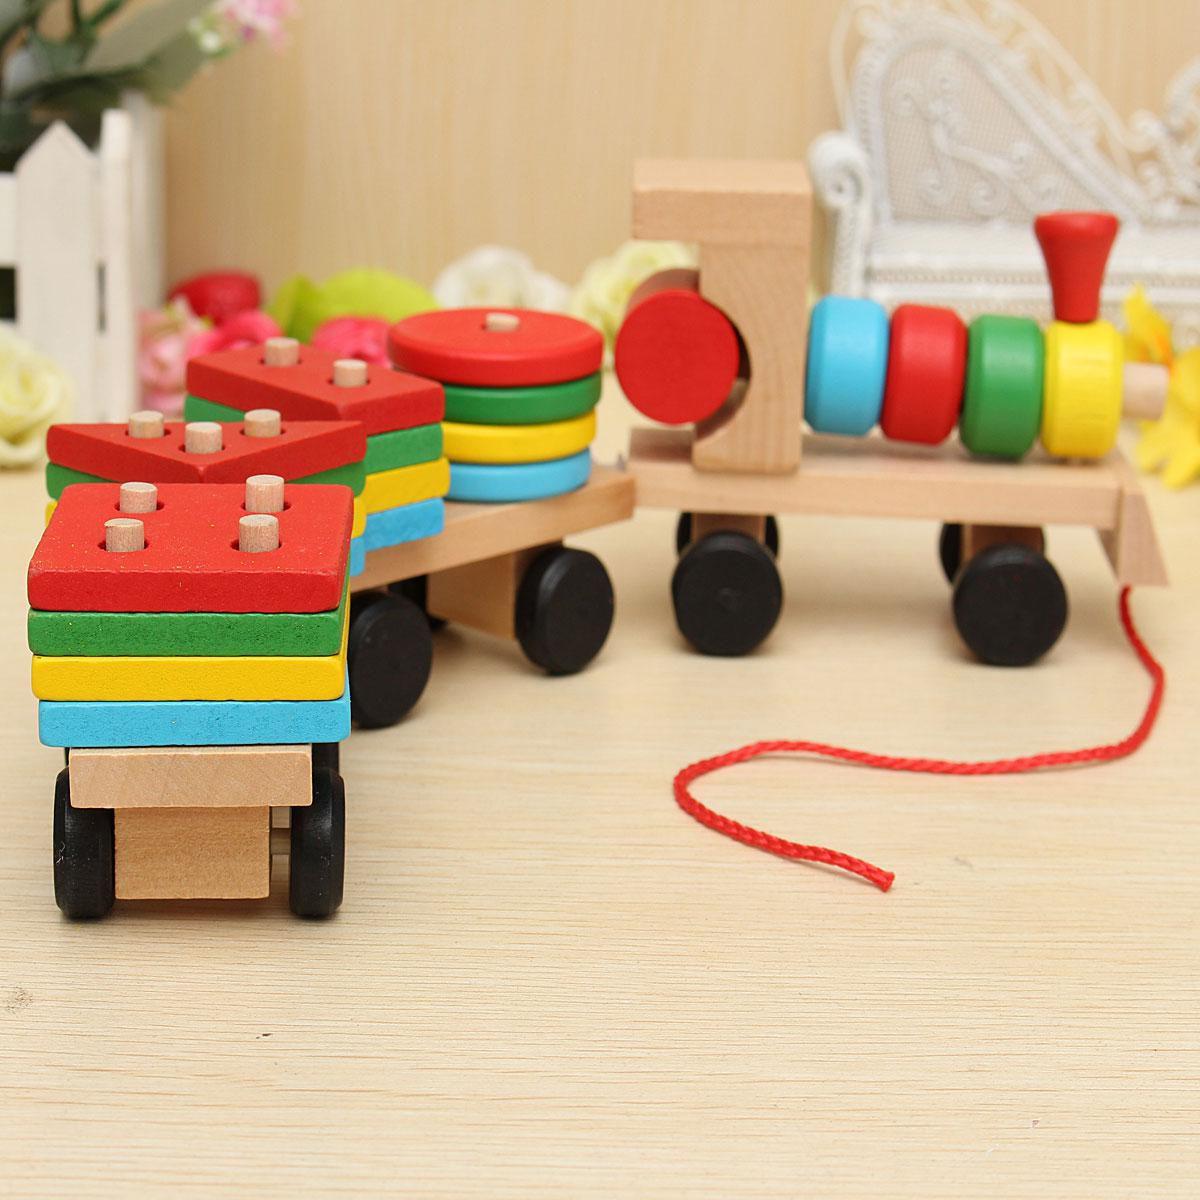 Toy Fun Vehicle Block Board Game Toy Toddler Baby Wooden Stacking Train Block